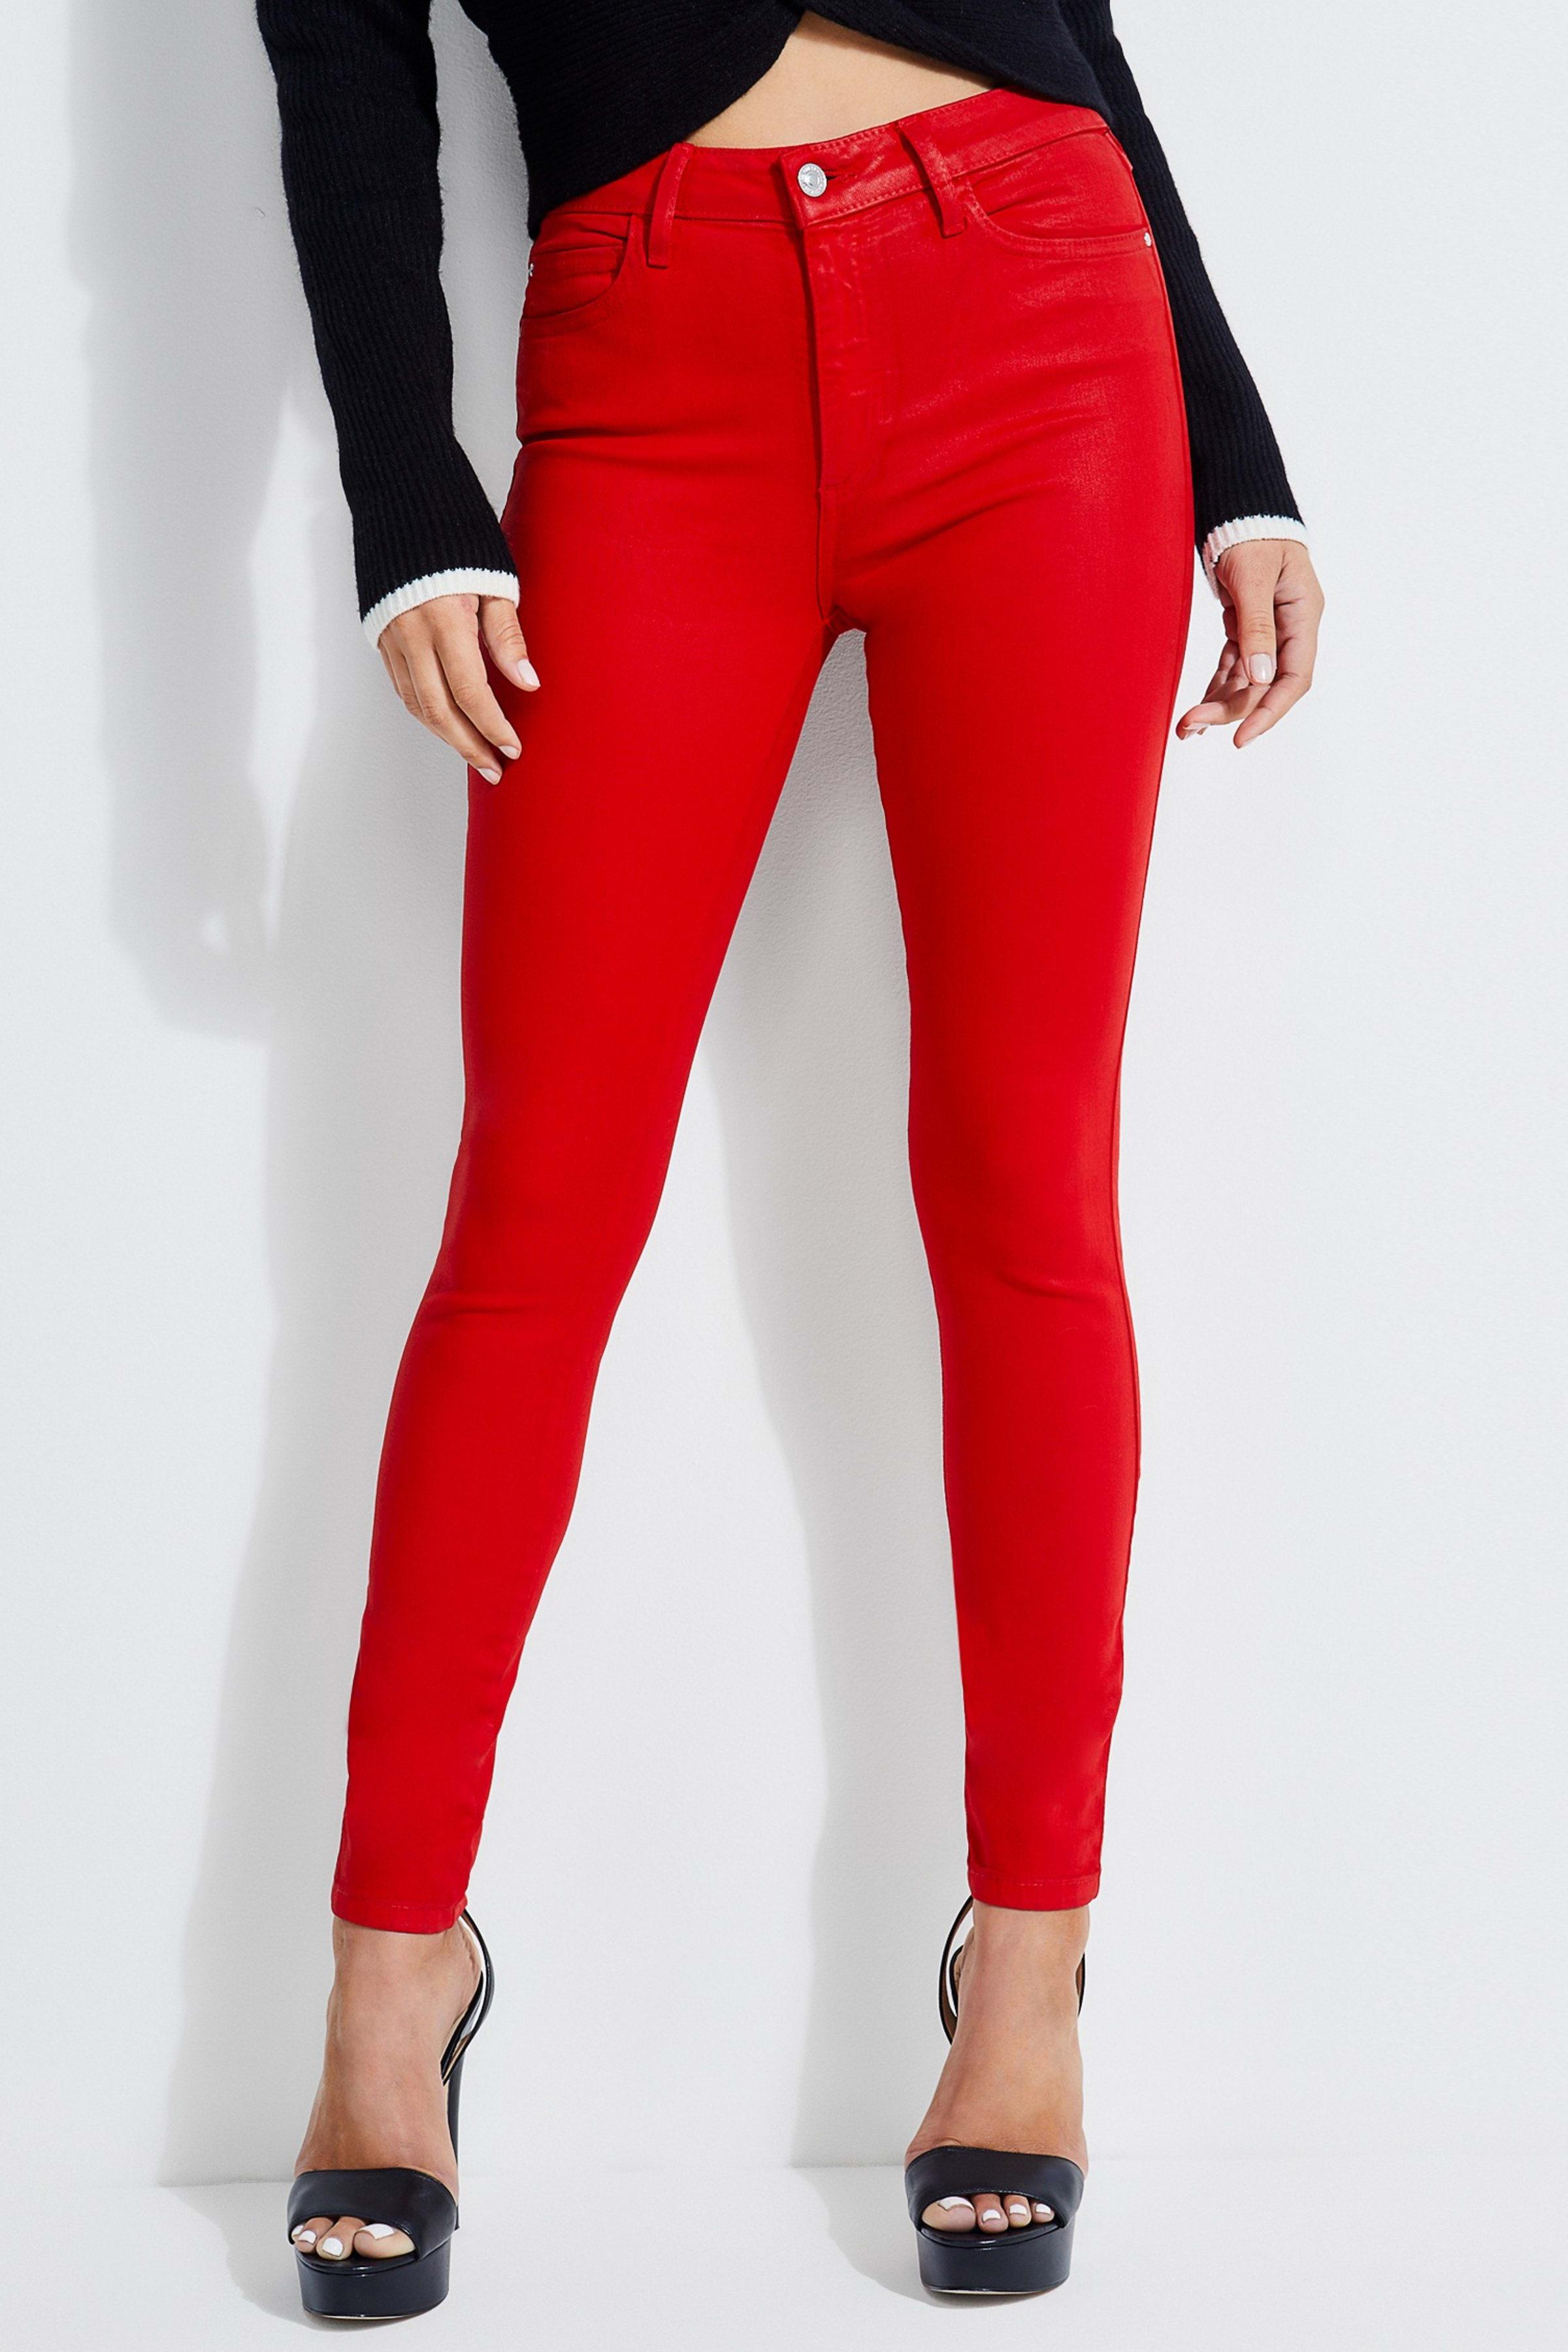 1981 High Rise Coated Skinny Jeans